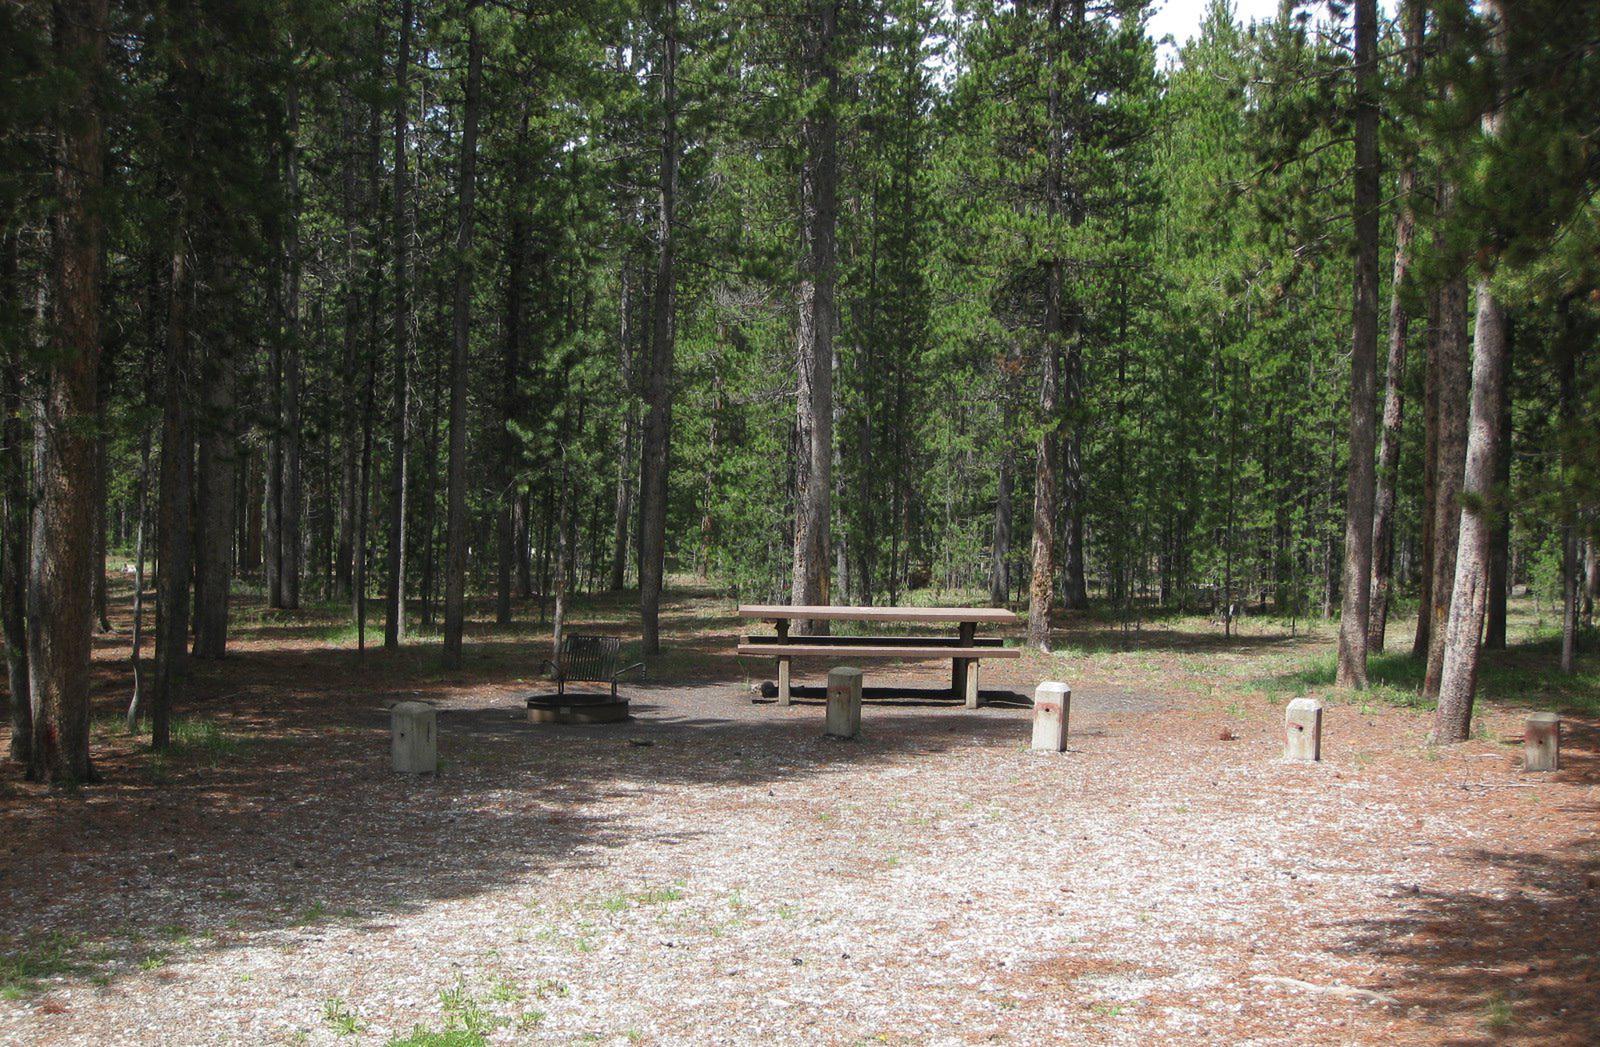 Site B11